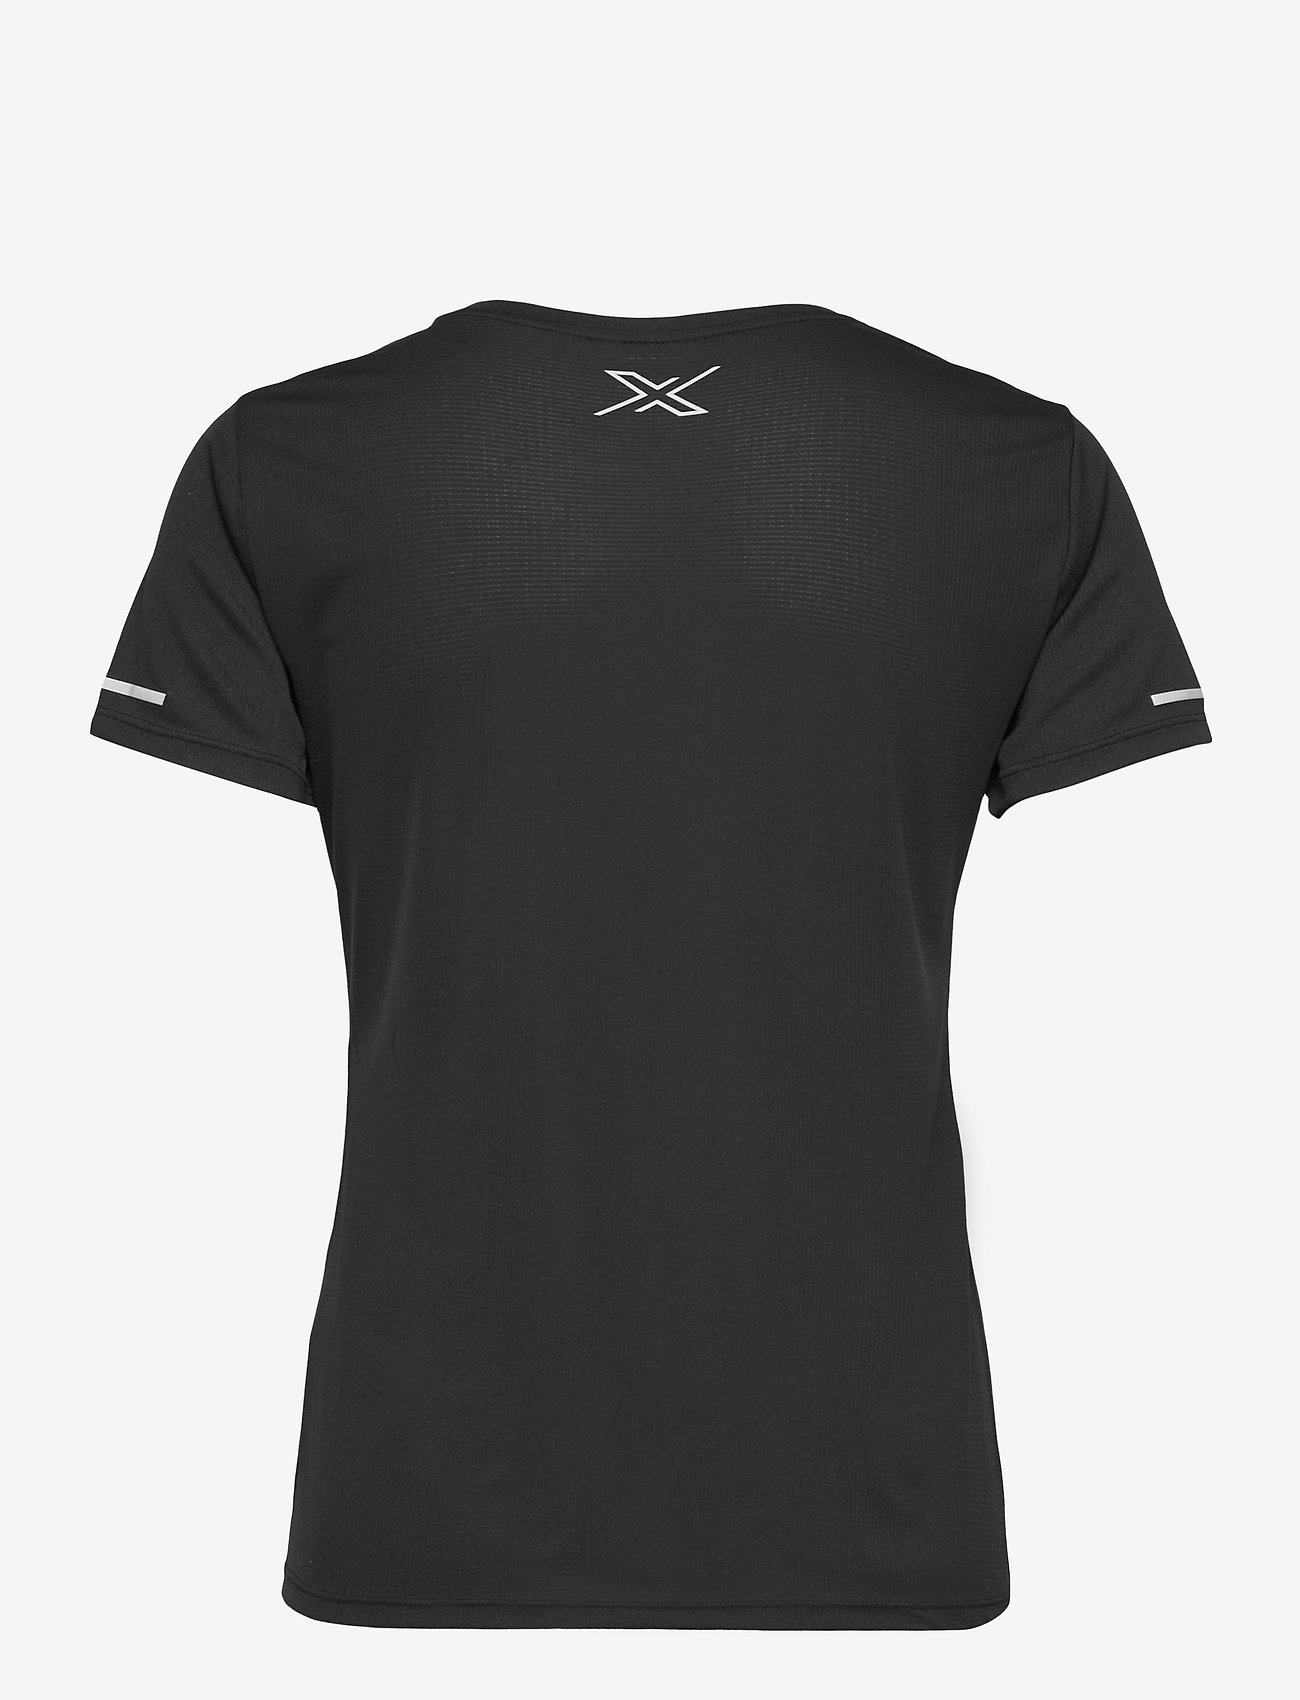 2XU - AERO TEE - t-shirts - black/silver reflective - 1